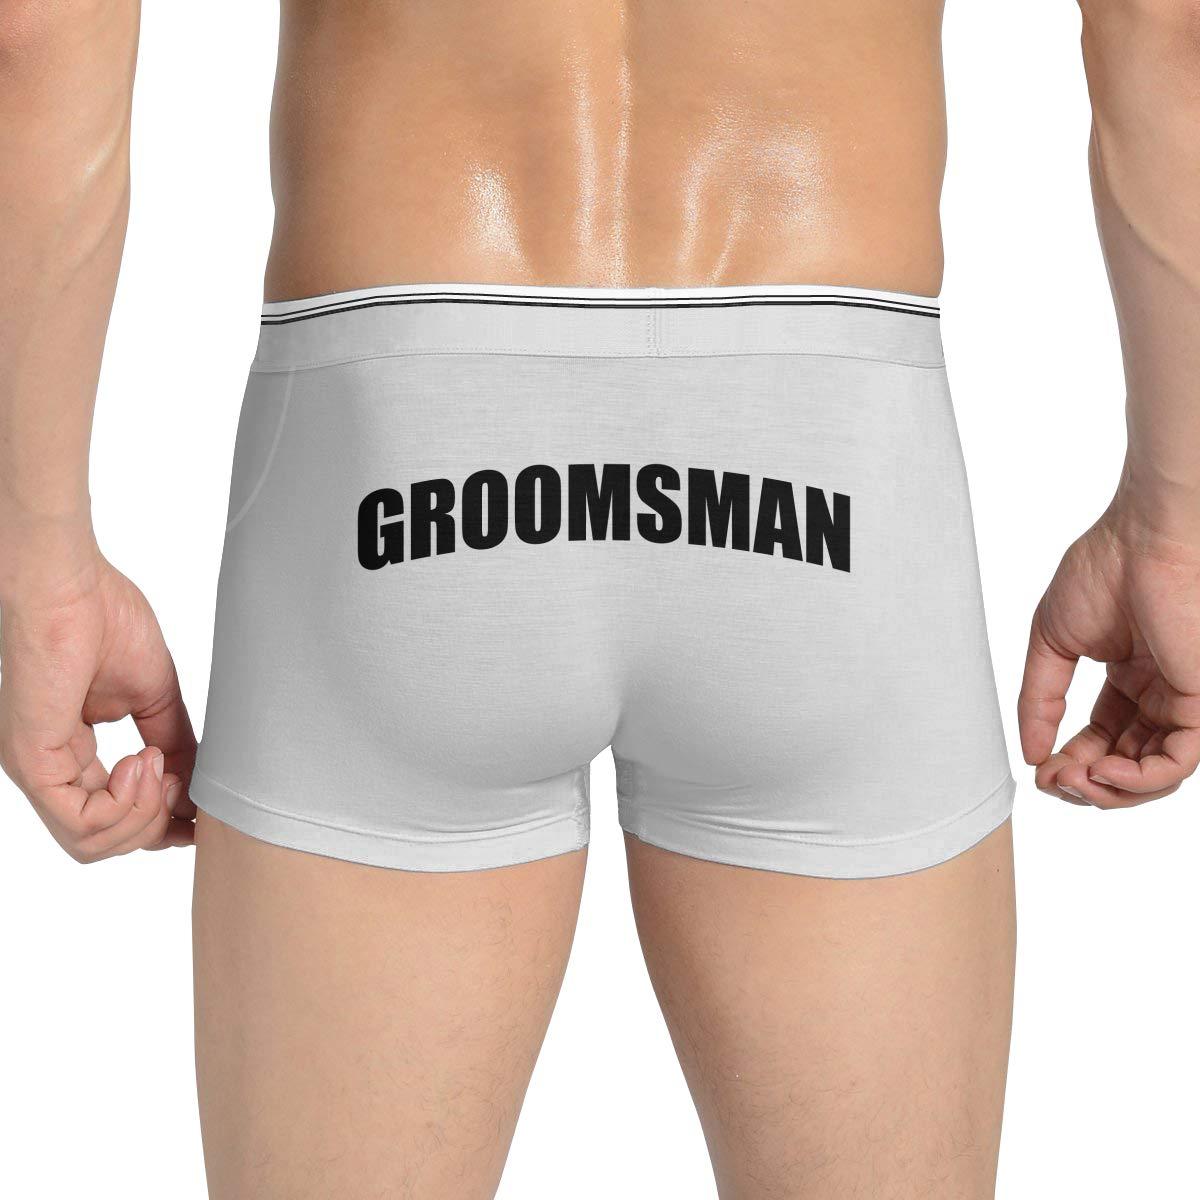 ShowRoom16 Wedding Boxer Briefs Wedding Underwear Groom Boxers Groomsmen Boxer Briefs Best Man Gifts